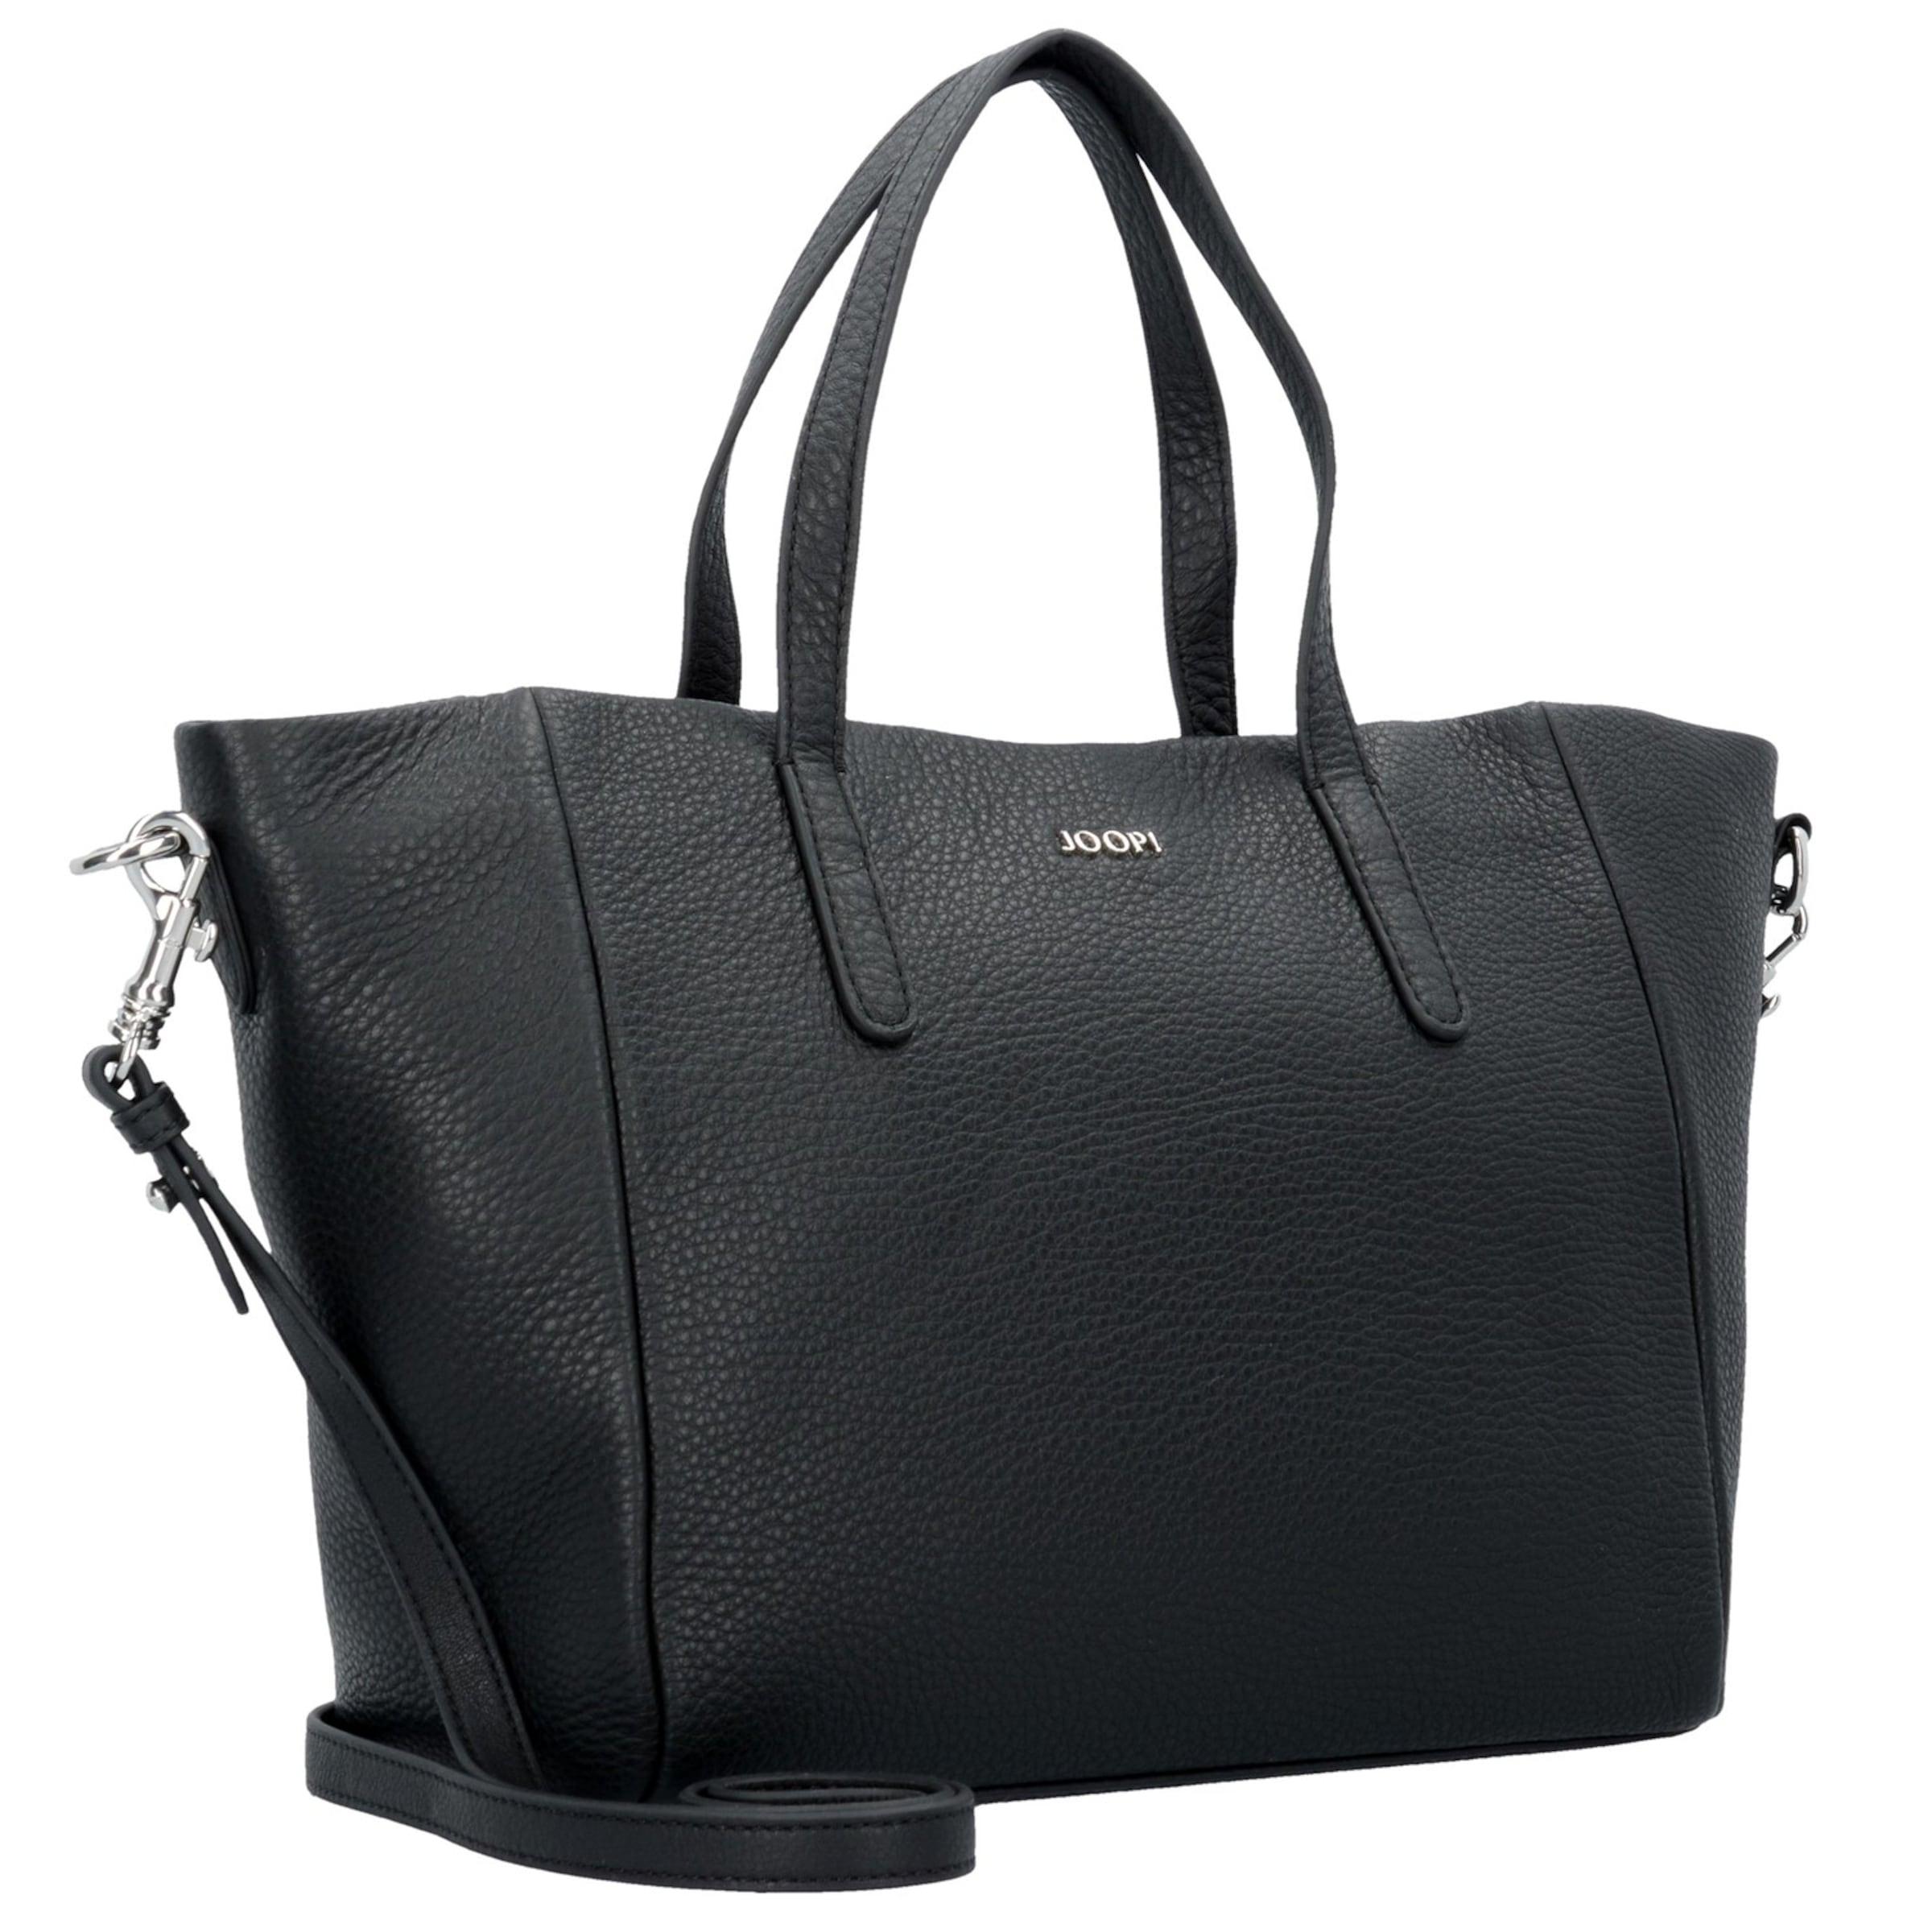 Handtasche Schwarz In JoopHelena 27 Cm Leder sdBtQxhrC